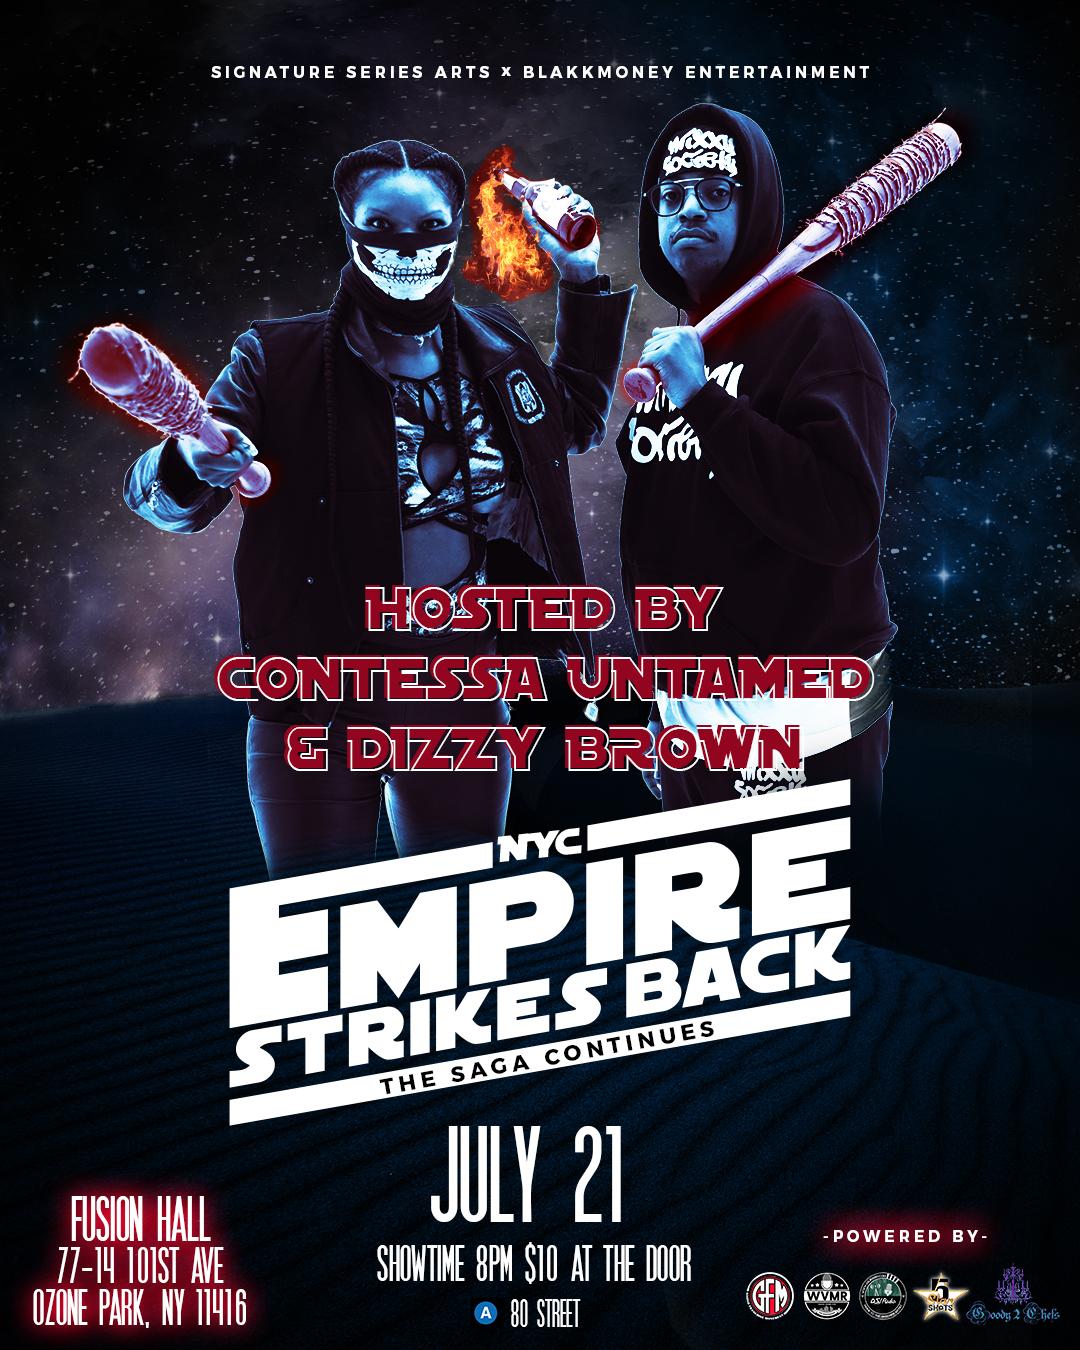 Blakkmoney Entertainment & Signature Series Arts Present 'NYC Empire Strike Back'